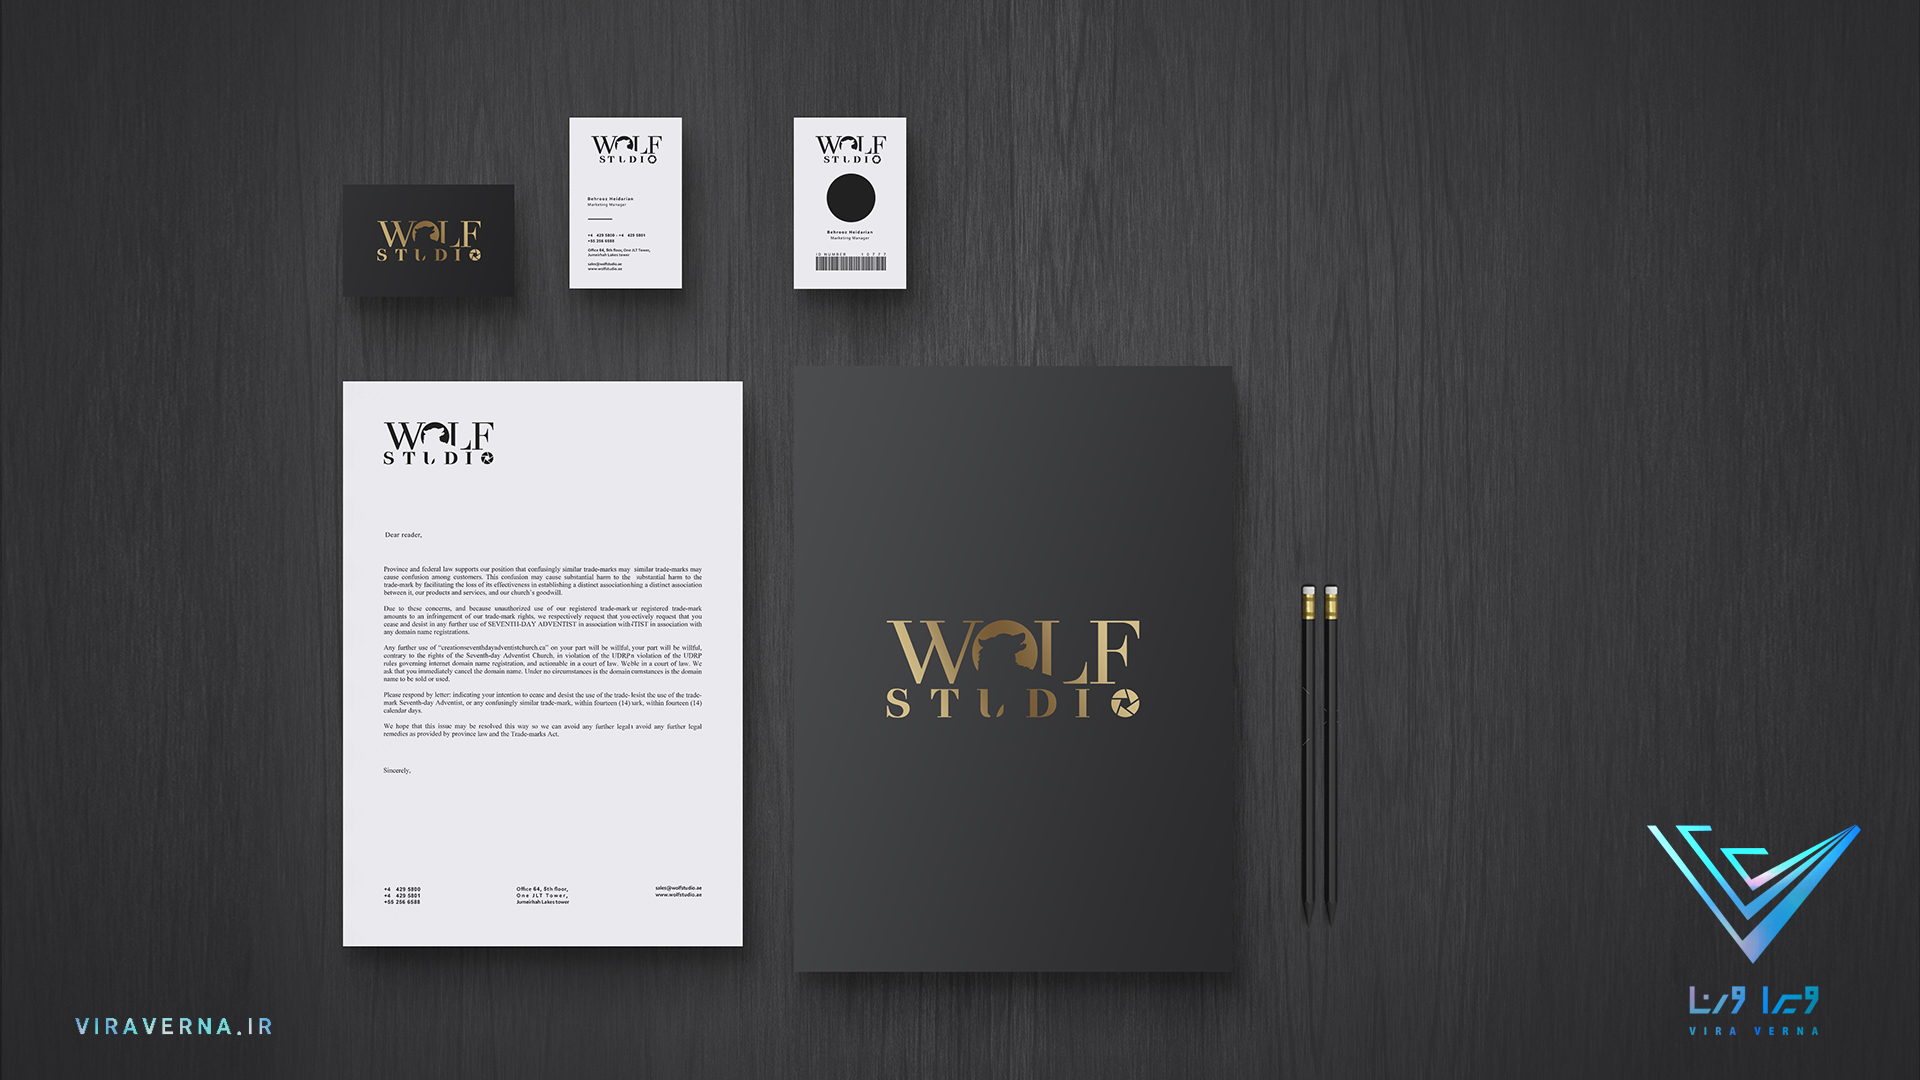 wolf-studio-06